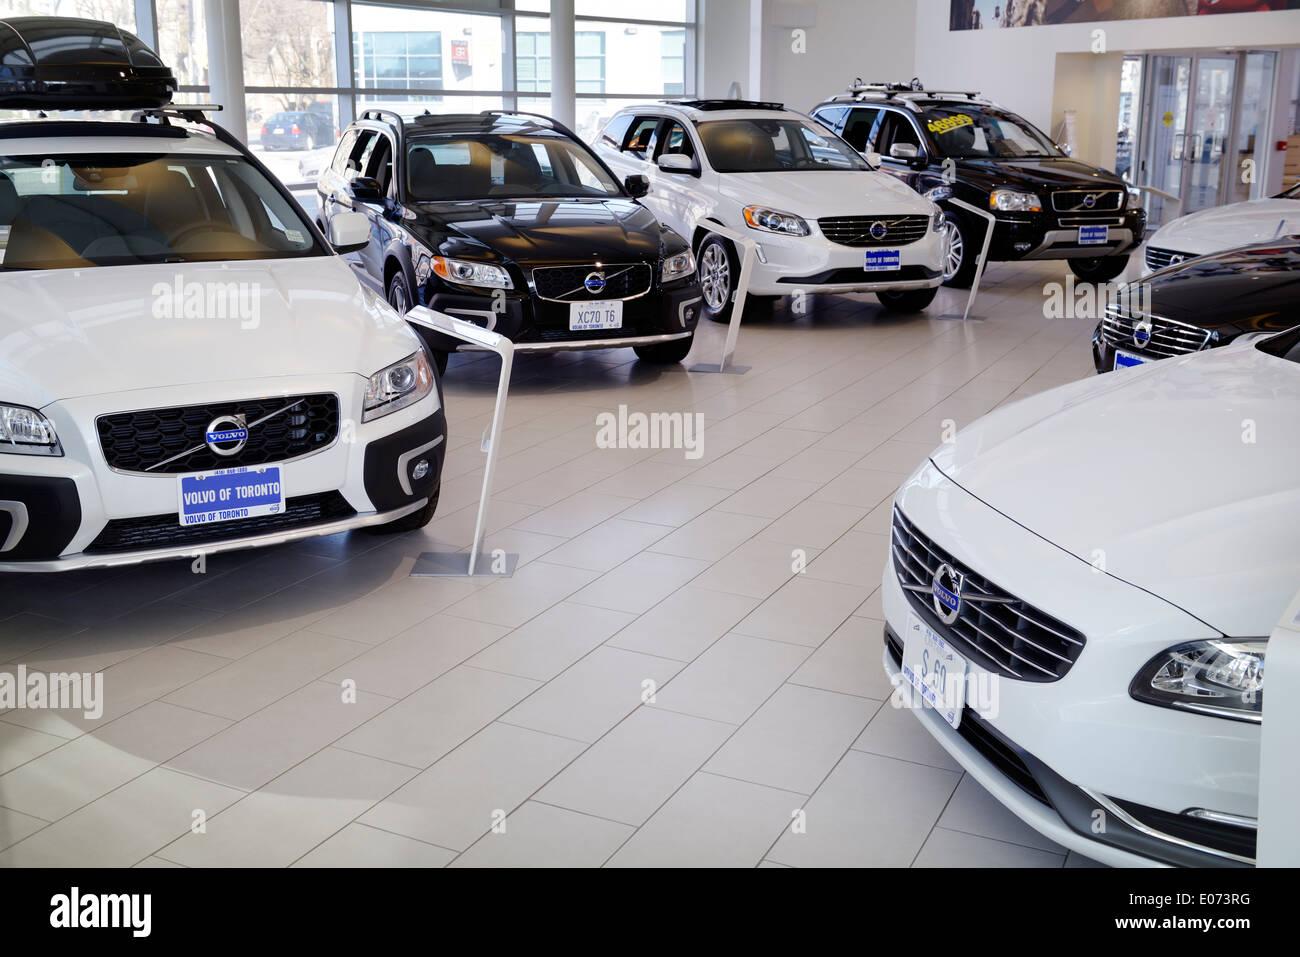 Car Dealers Toronto >> Volvo Cars Inside A Dealership Toronto Canada Stock Photo